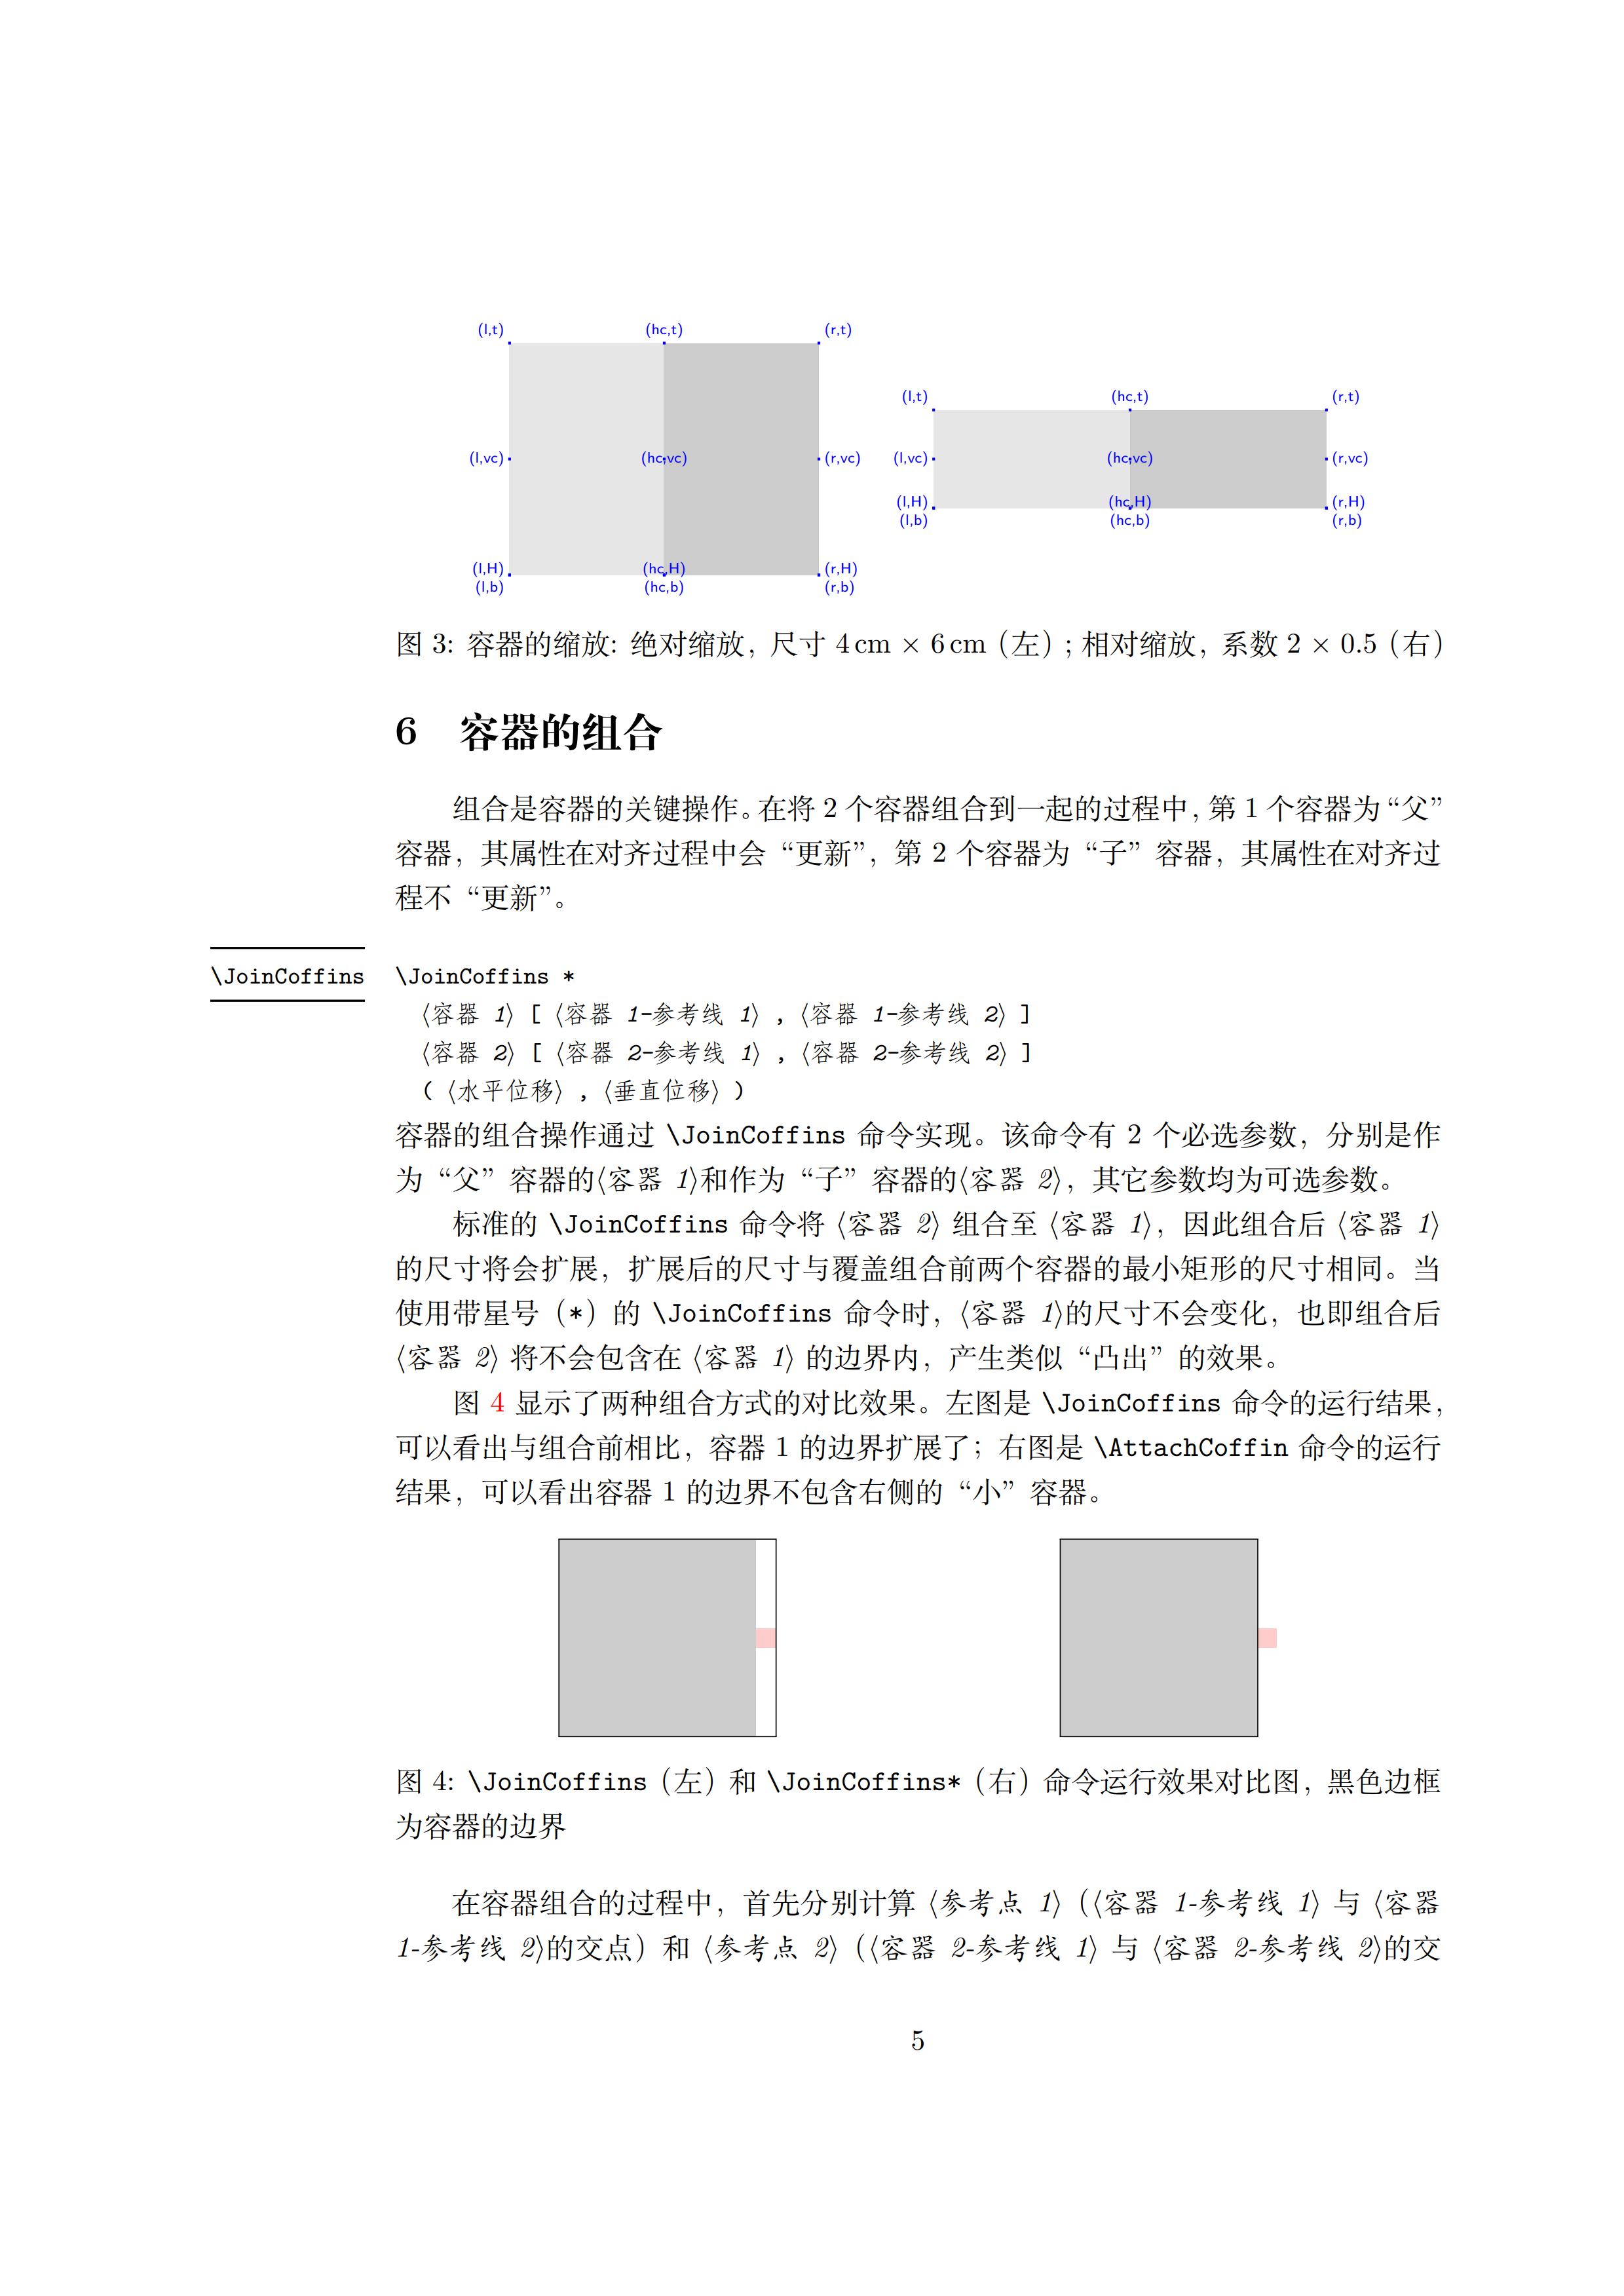 xcoffins 宏包手册帮助文档(中译版)